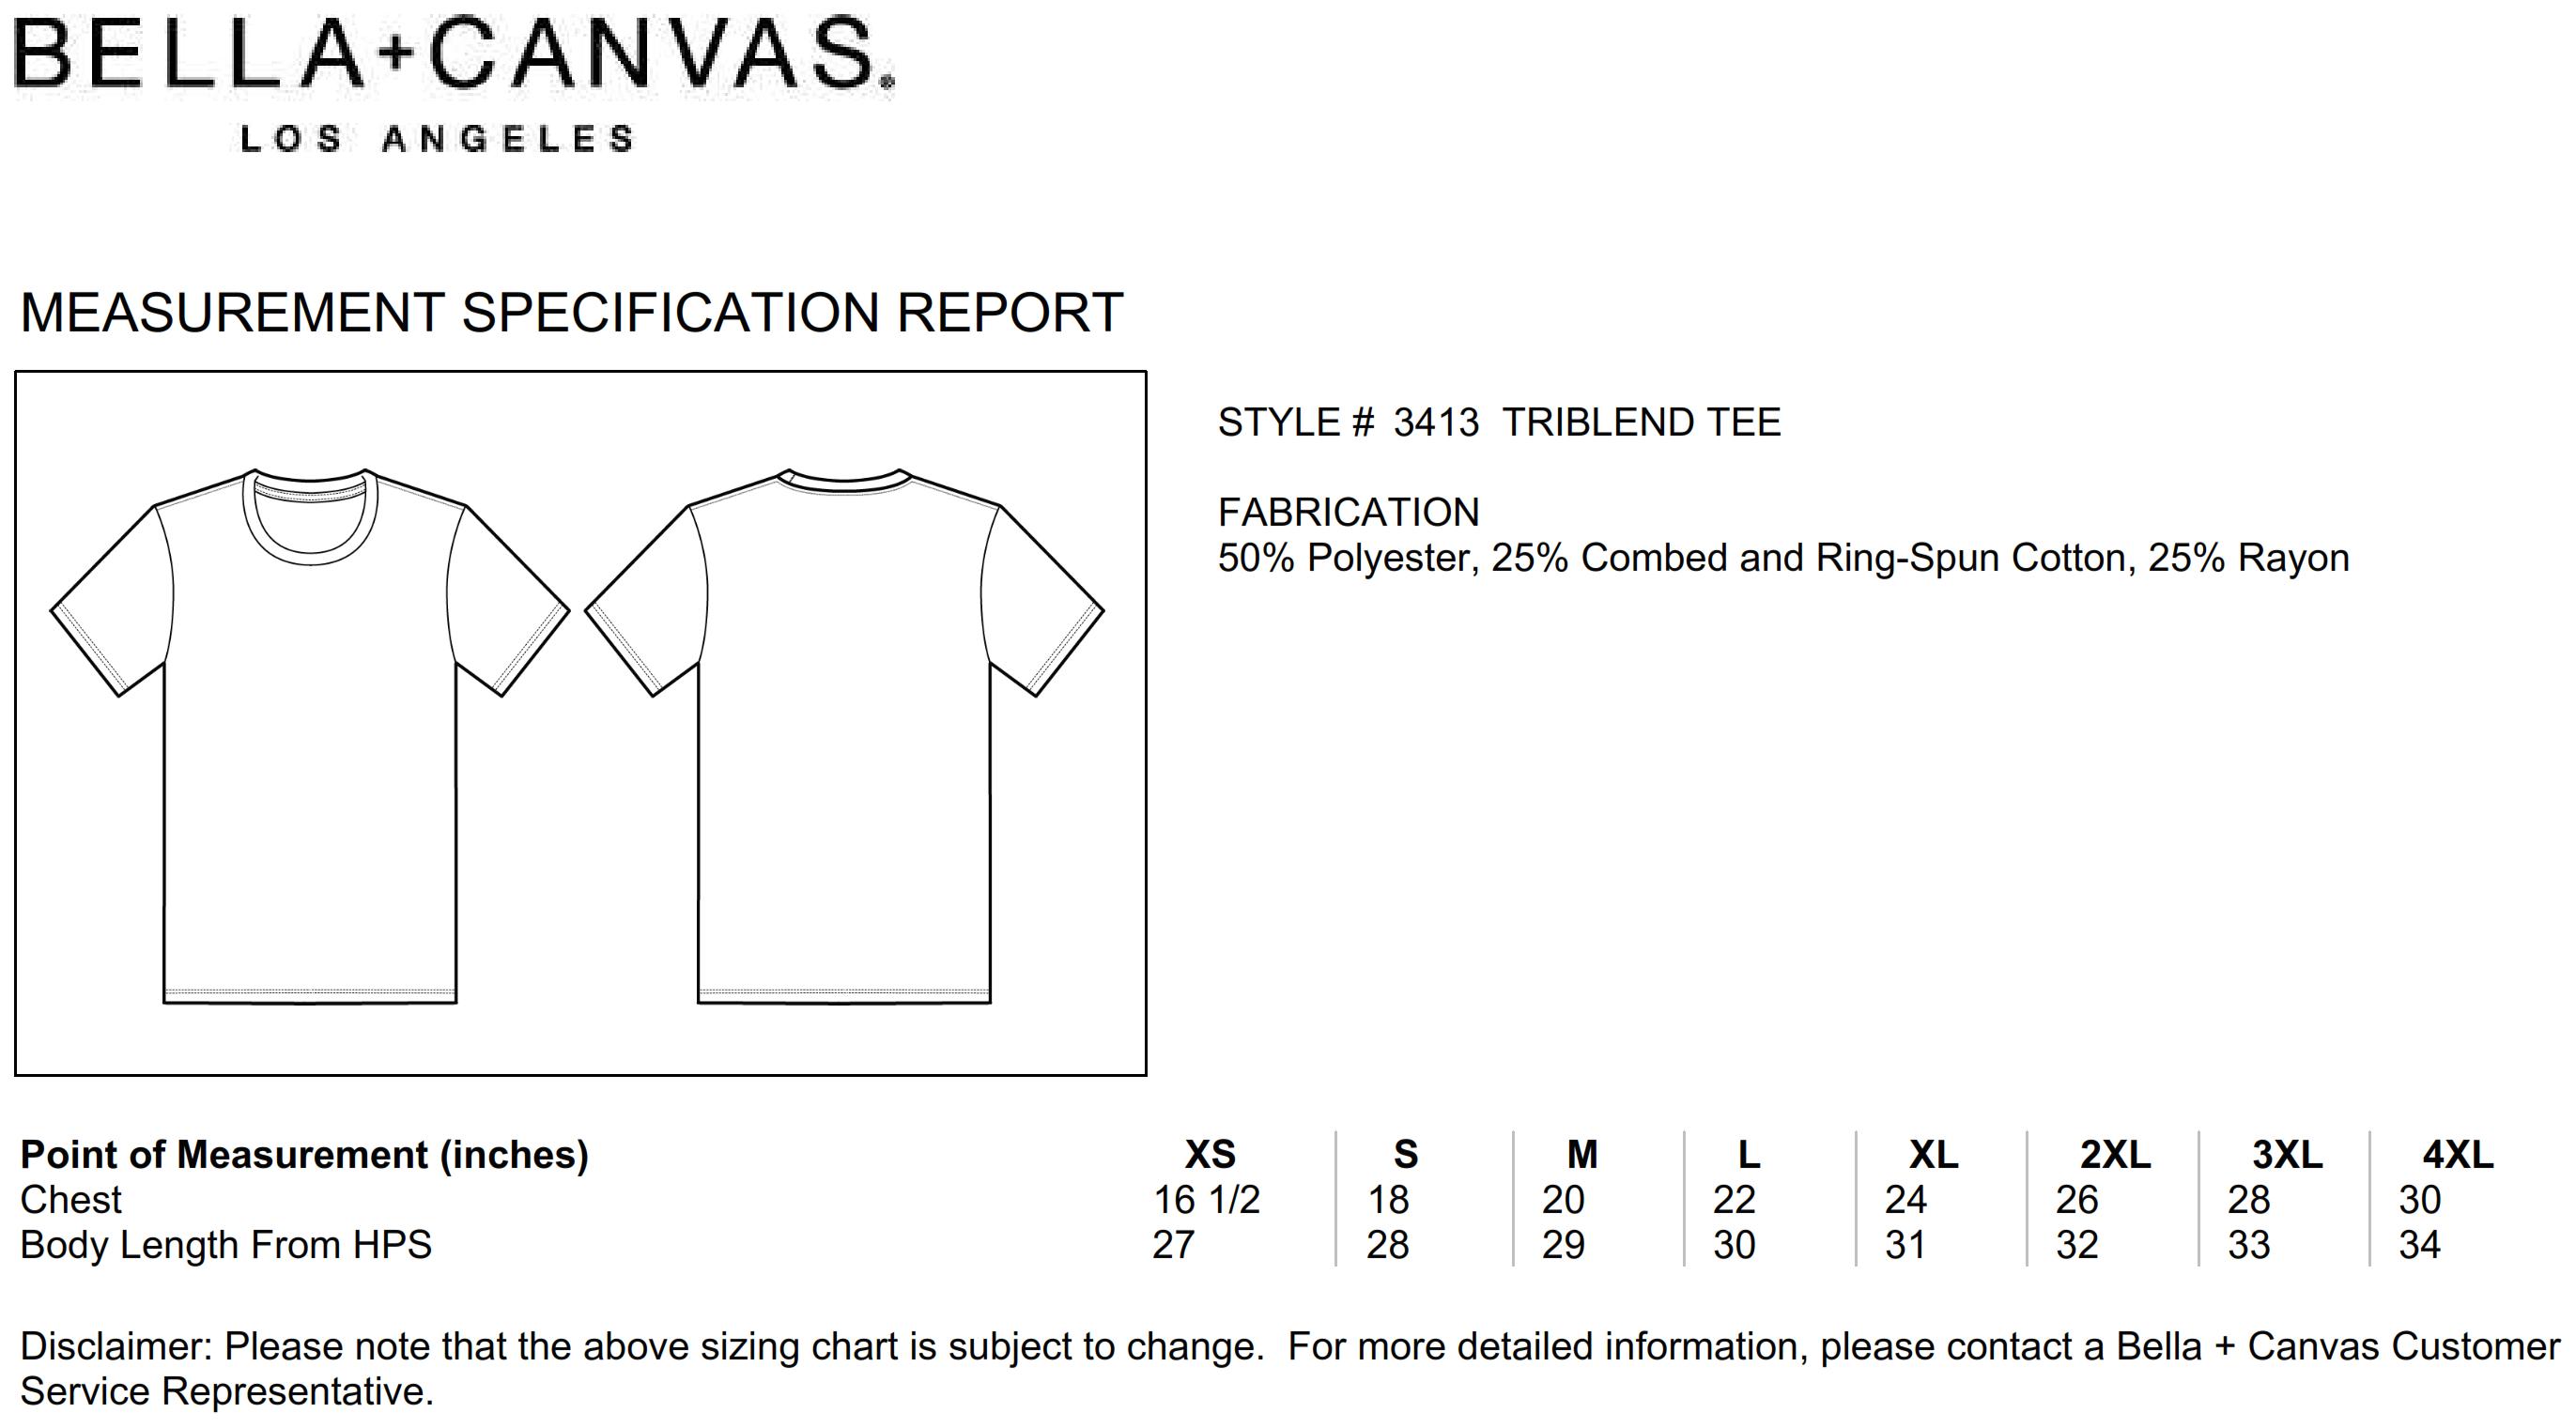 Bella+Canvas: Unisex Triblend Crew Neck T-Shirt 3413